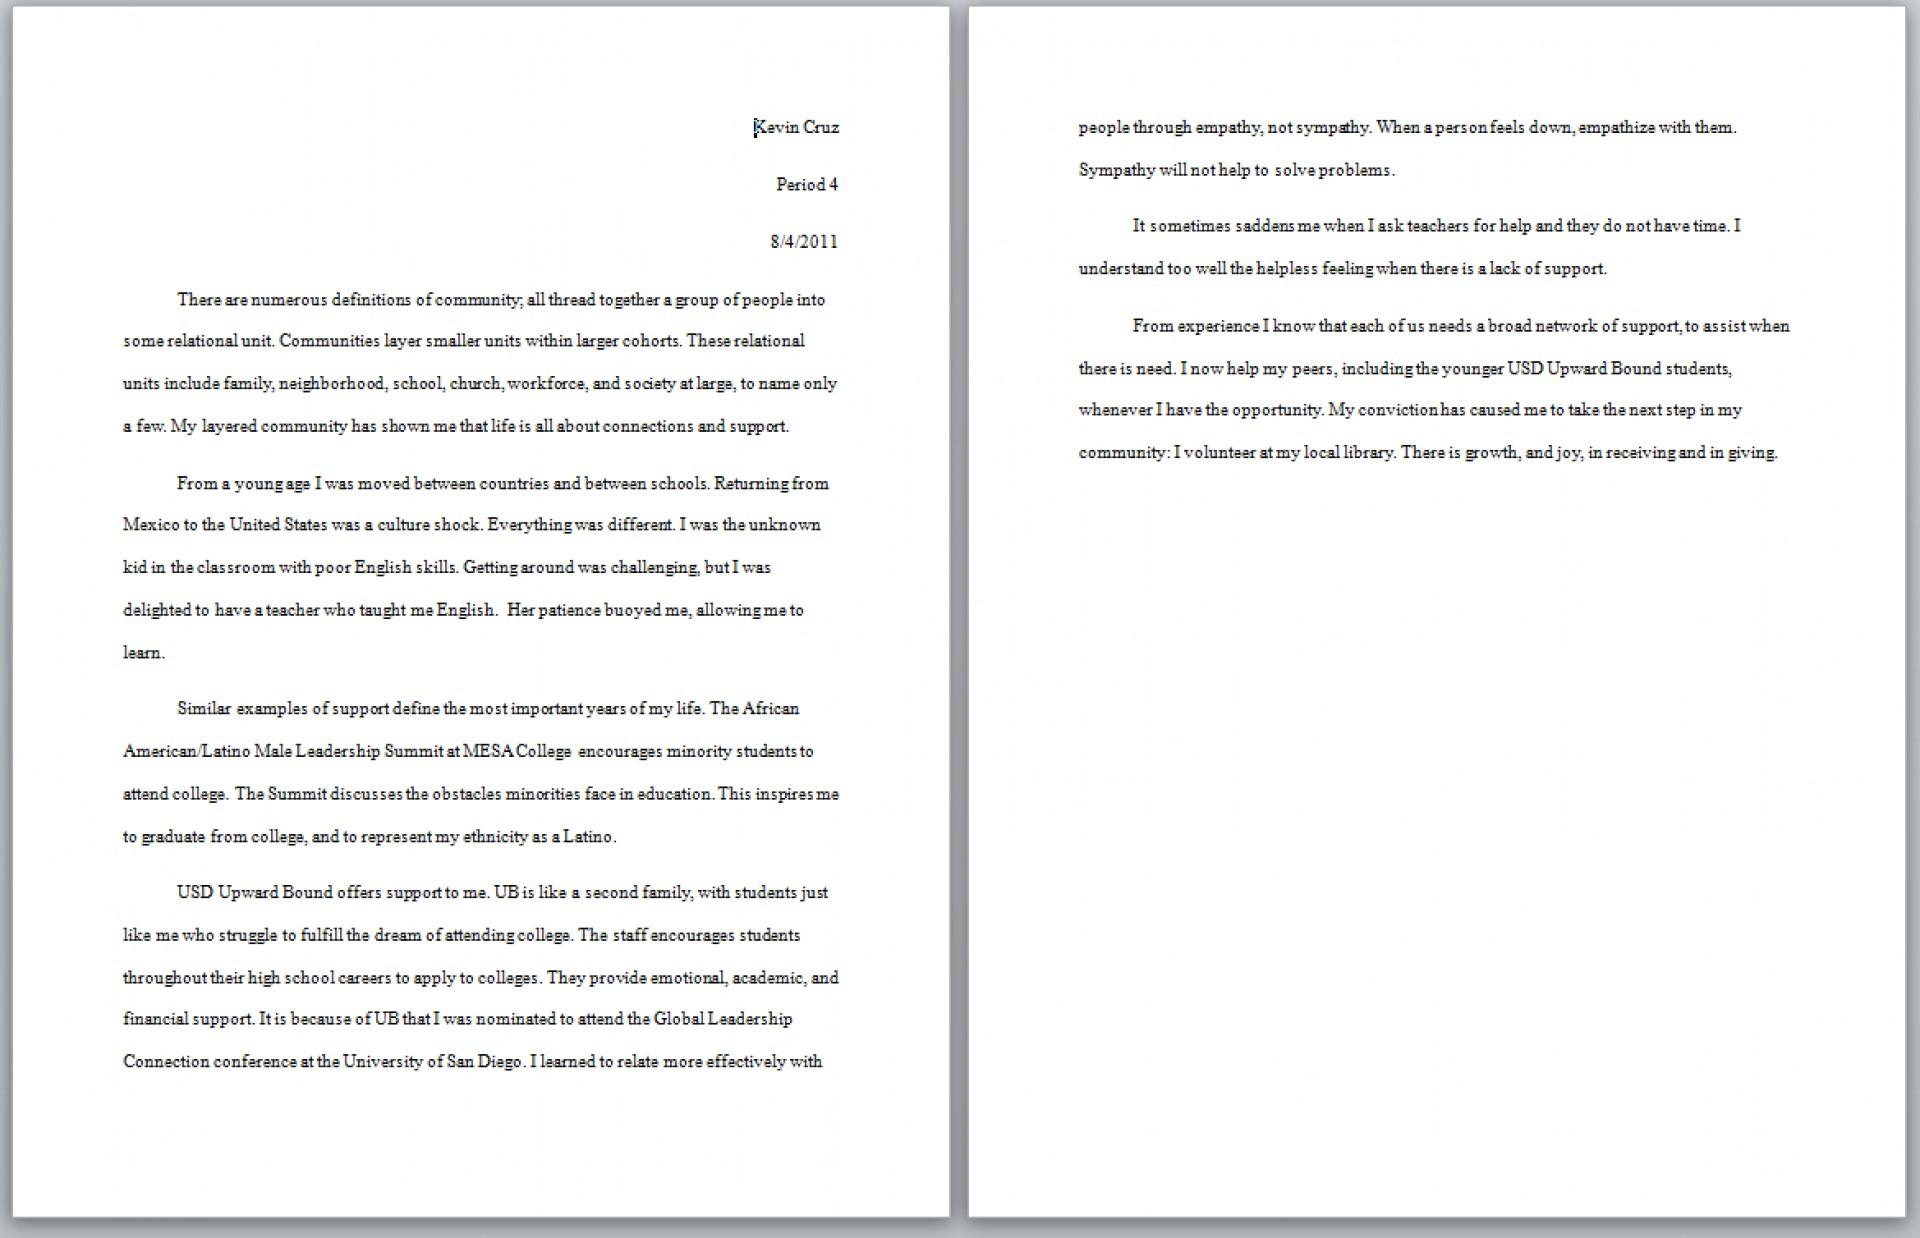 004 Usc Essay Prompt Prompt1 Sensational Prompts Engineering 2017 1920